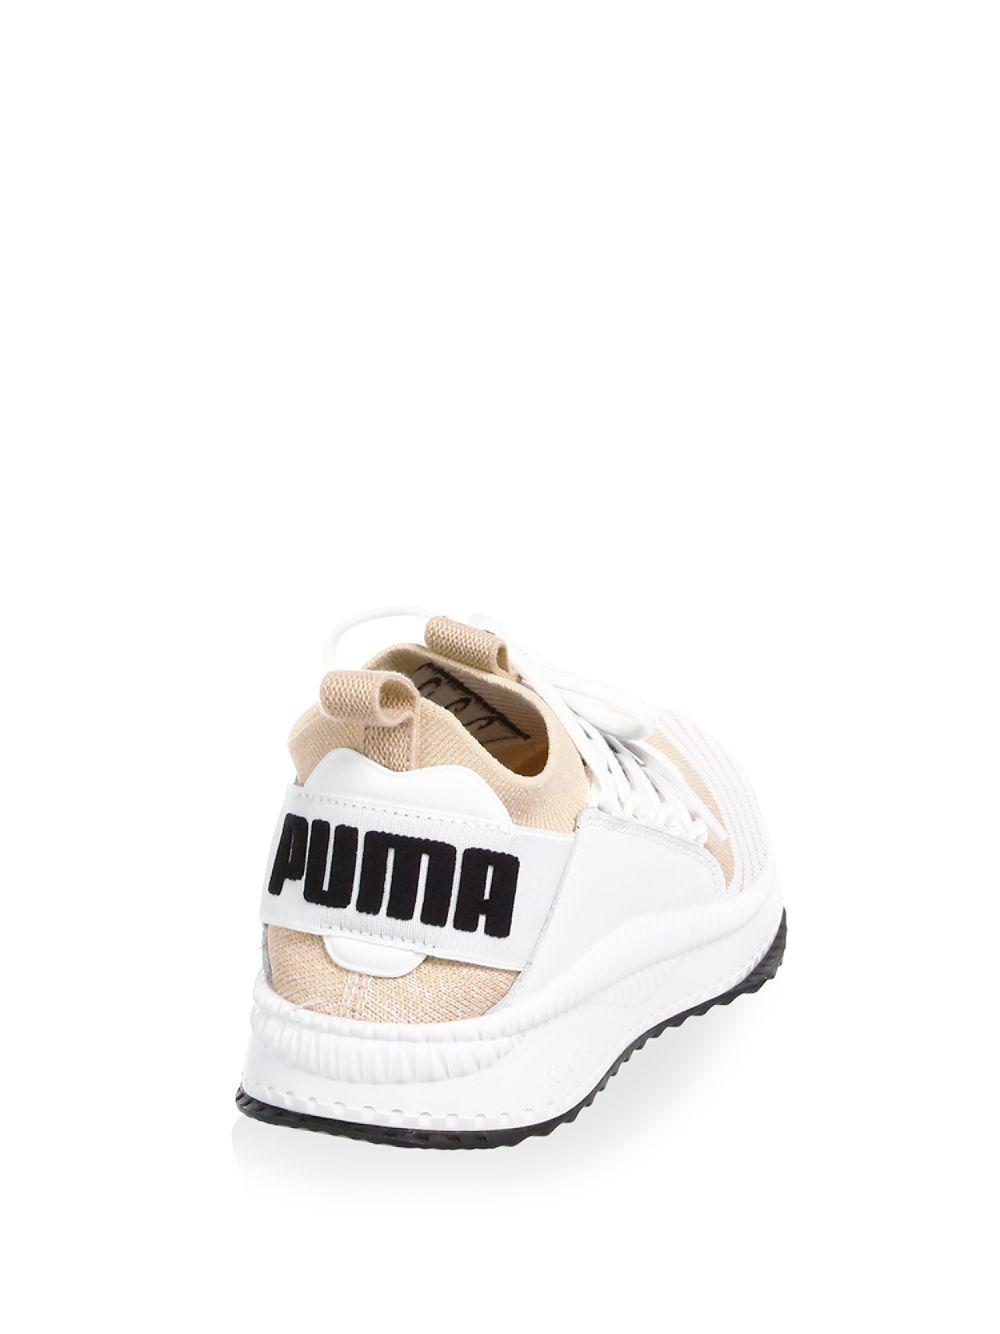 PUMA - Multicolor Tsugi Shinseiknit Fabric Logo Running Sneakers - Lyst.  View fullscreen 2a161644c